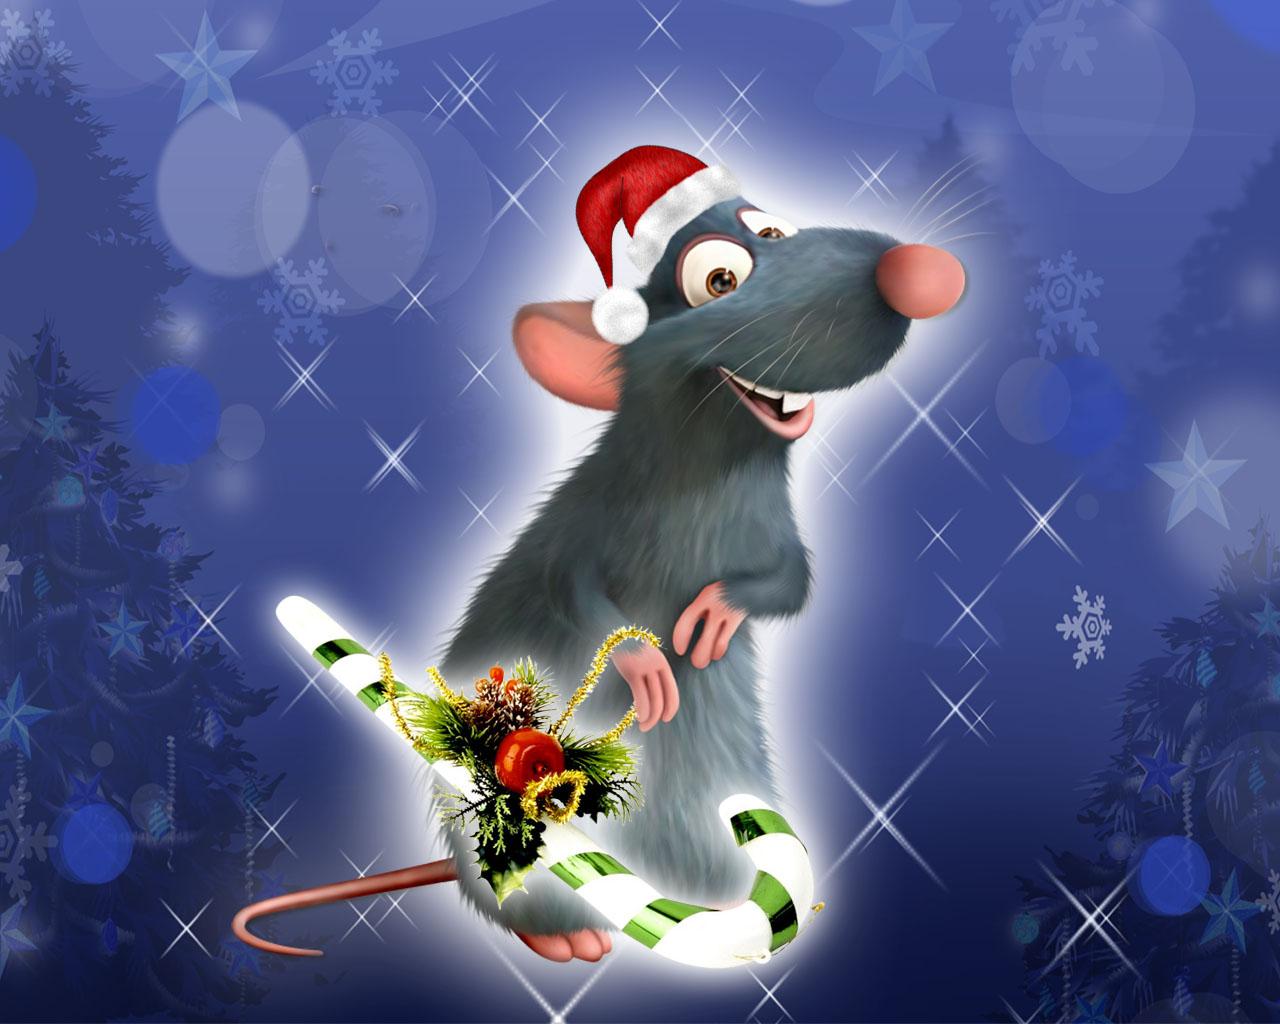 Ratatouille saludos fondos de pantalla Ratatouille saludos fotos 1280x1024